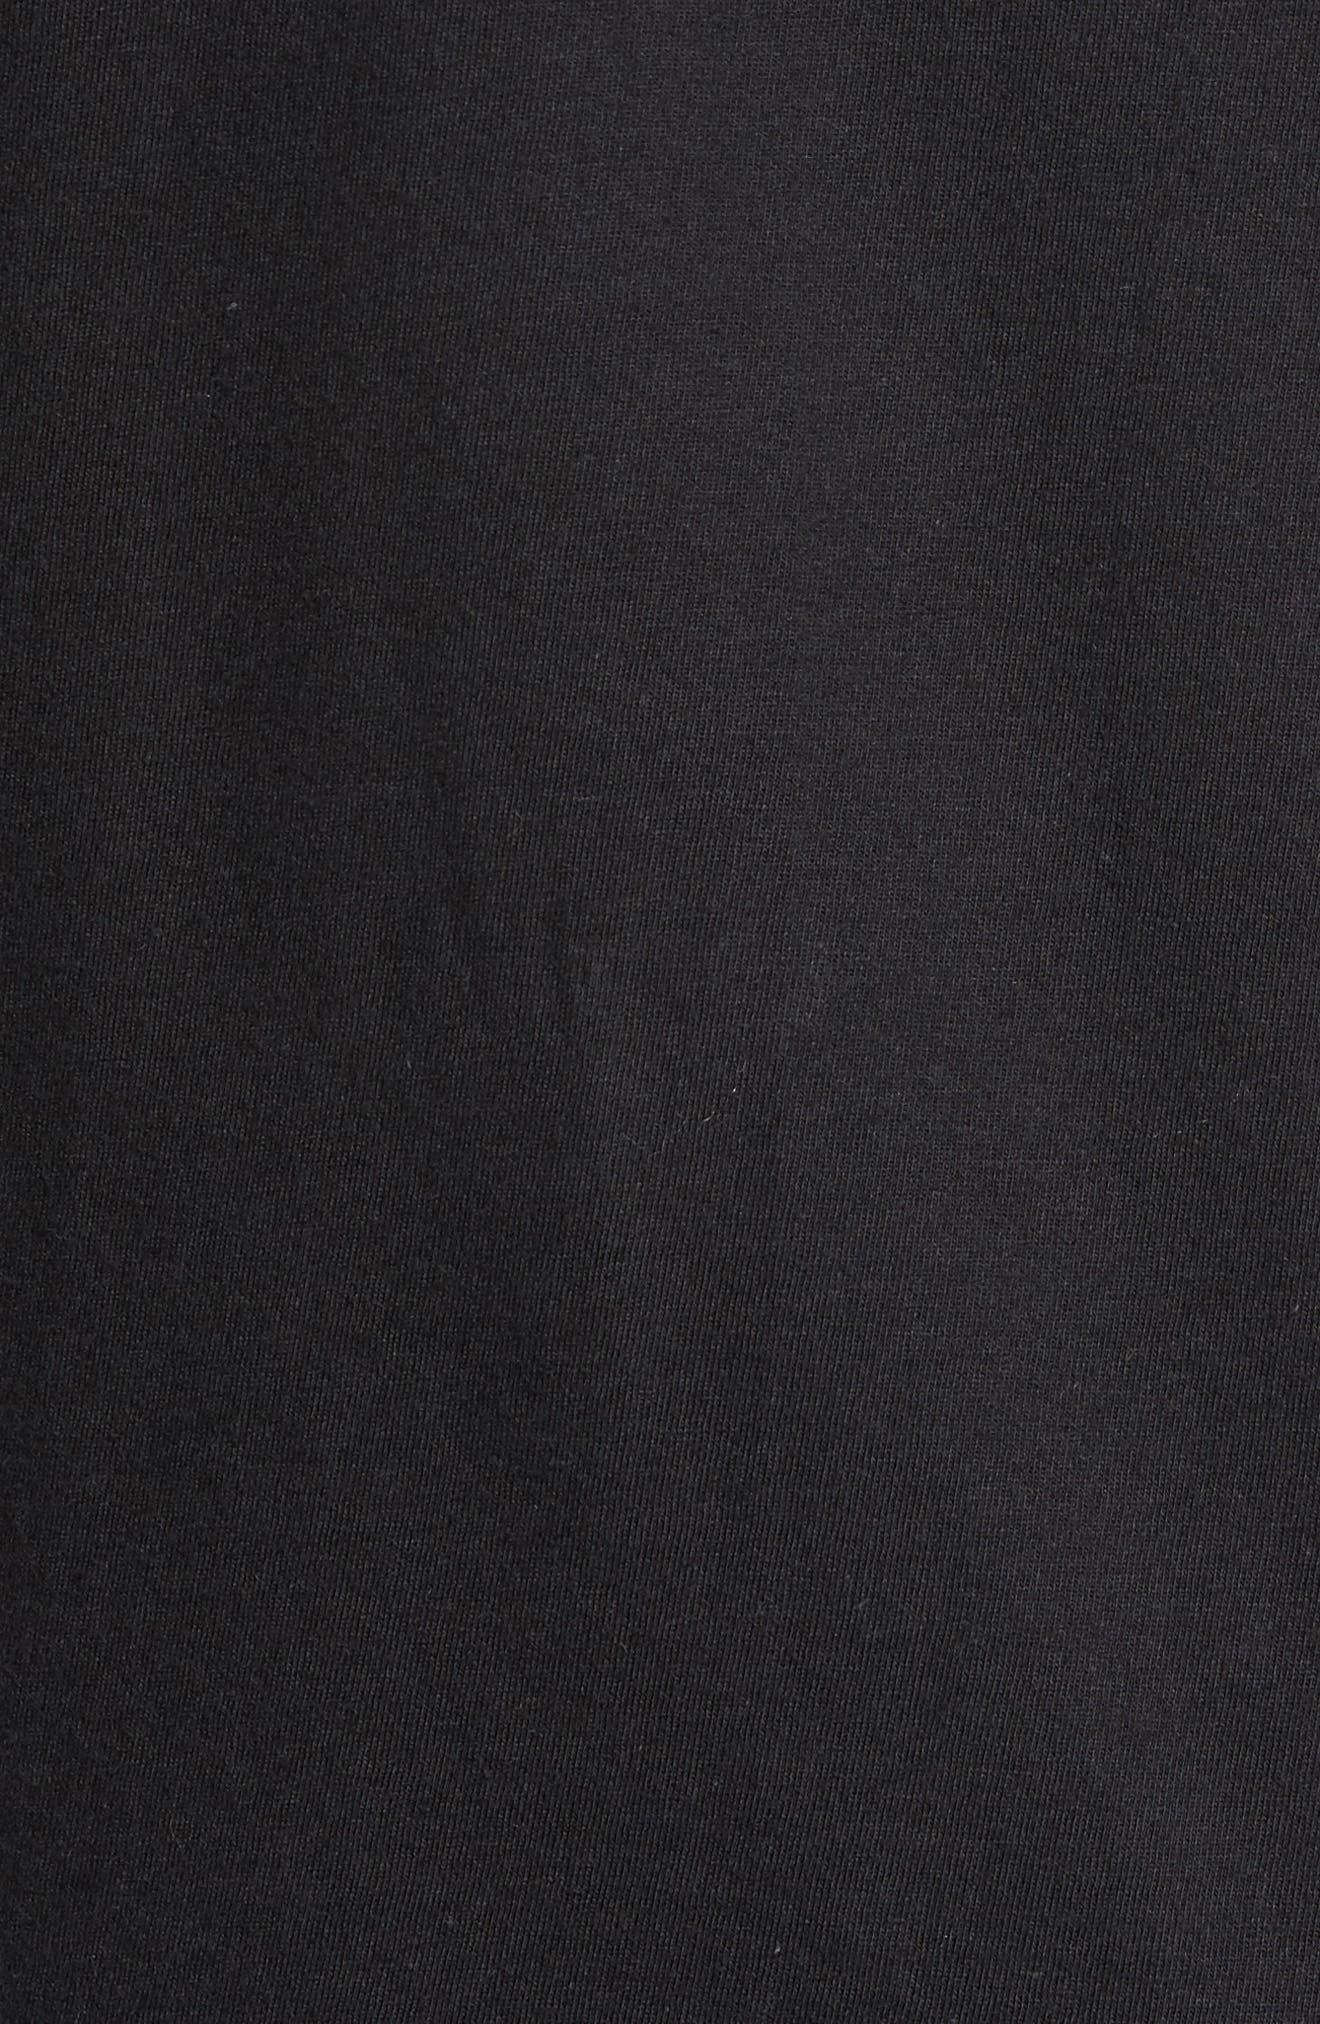 Tis The Season Embroidered T-Shirt,                             Alternate thumbnail 5, color,                             Black Tis The Season